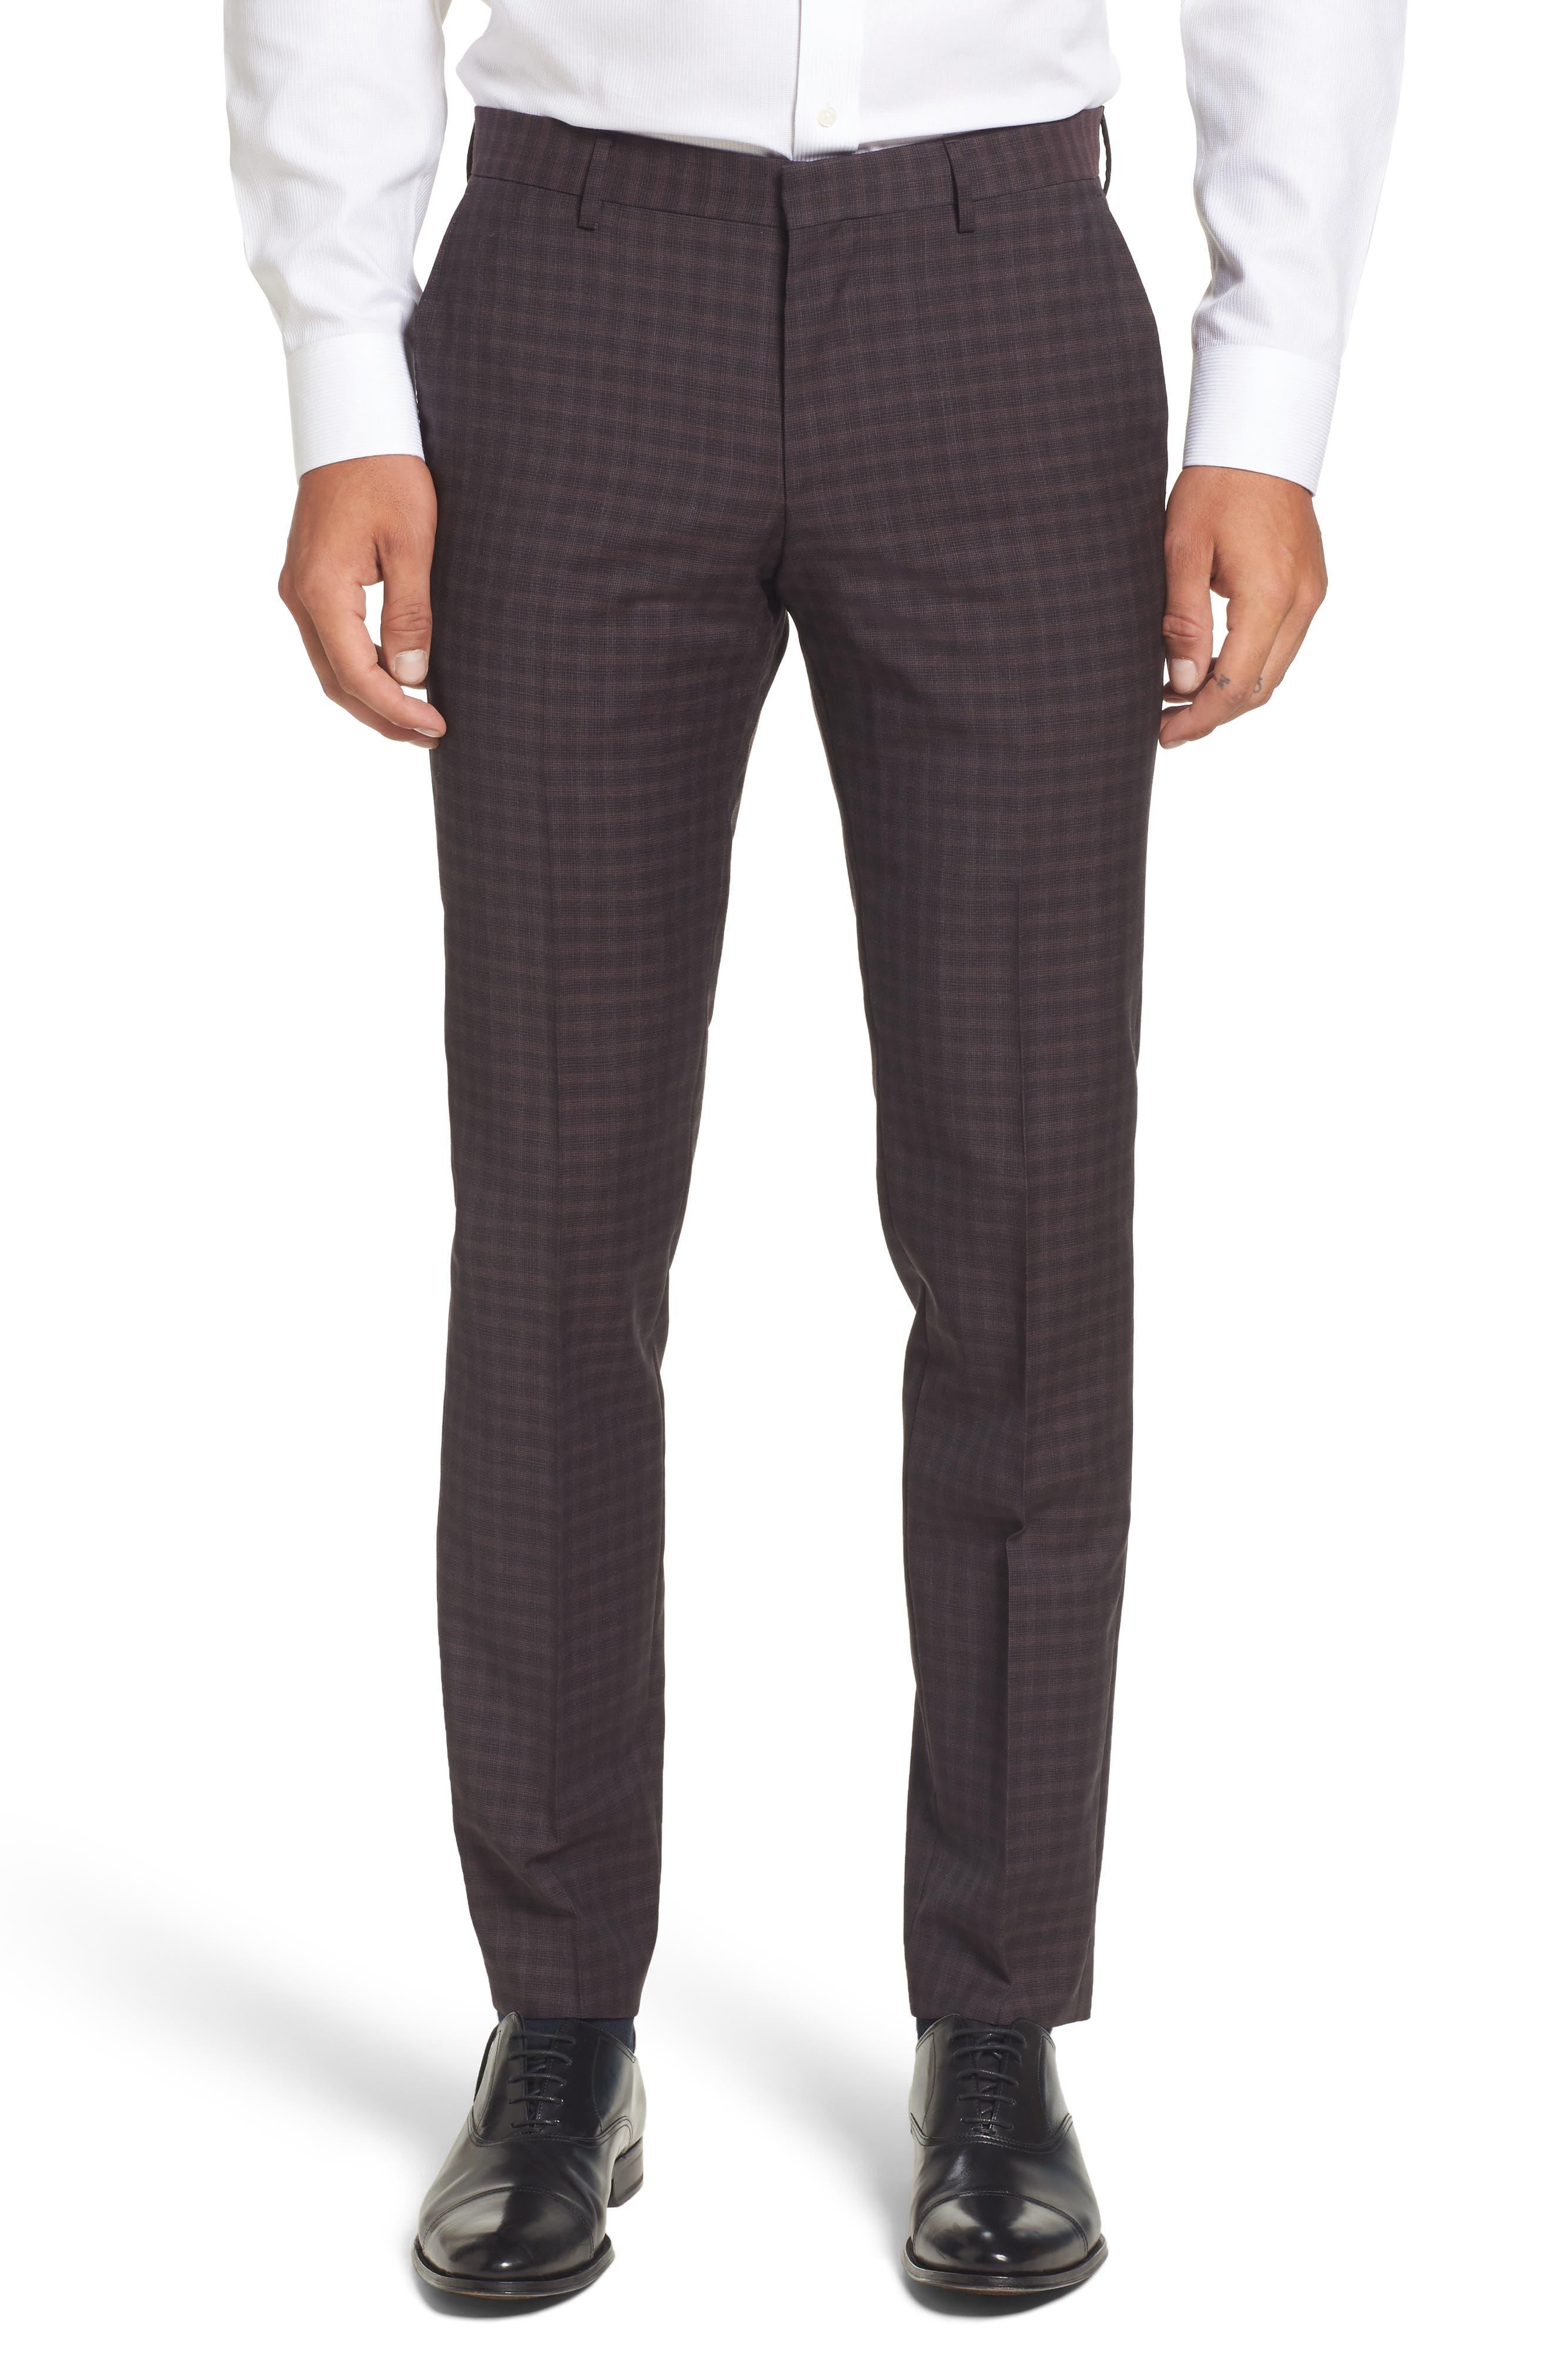 Benso Regular Fit Wool Trousers,                         Main,                         color, Dark Red